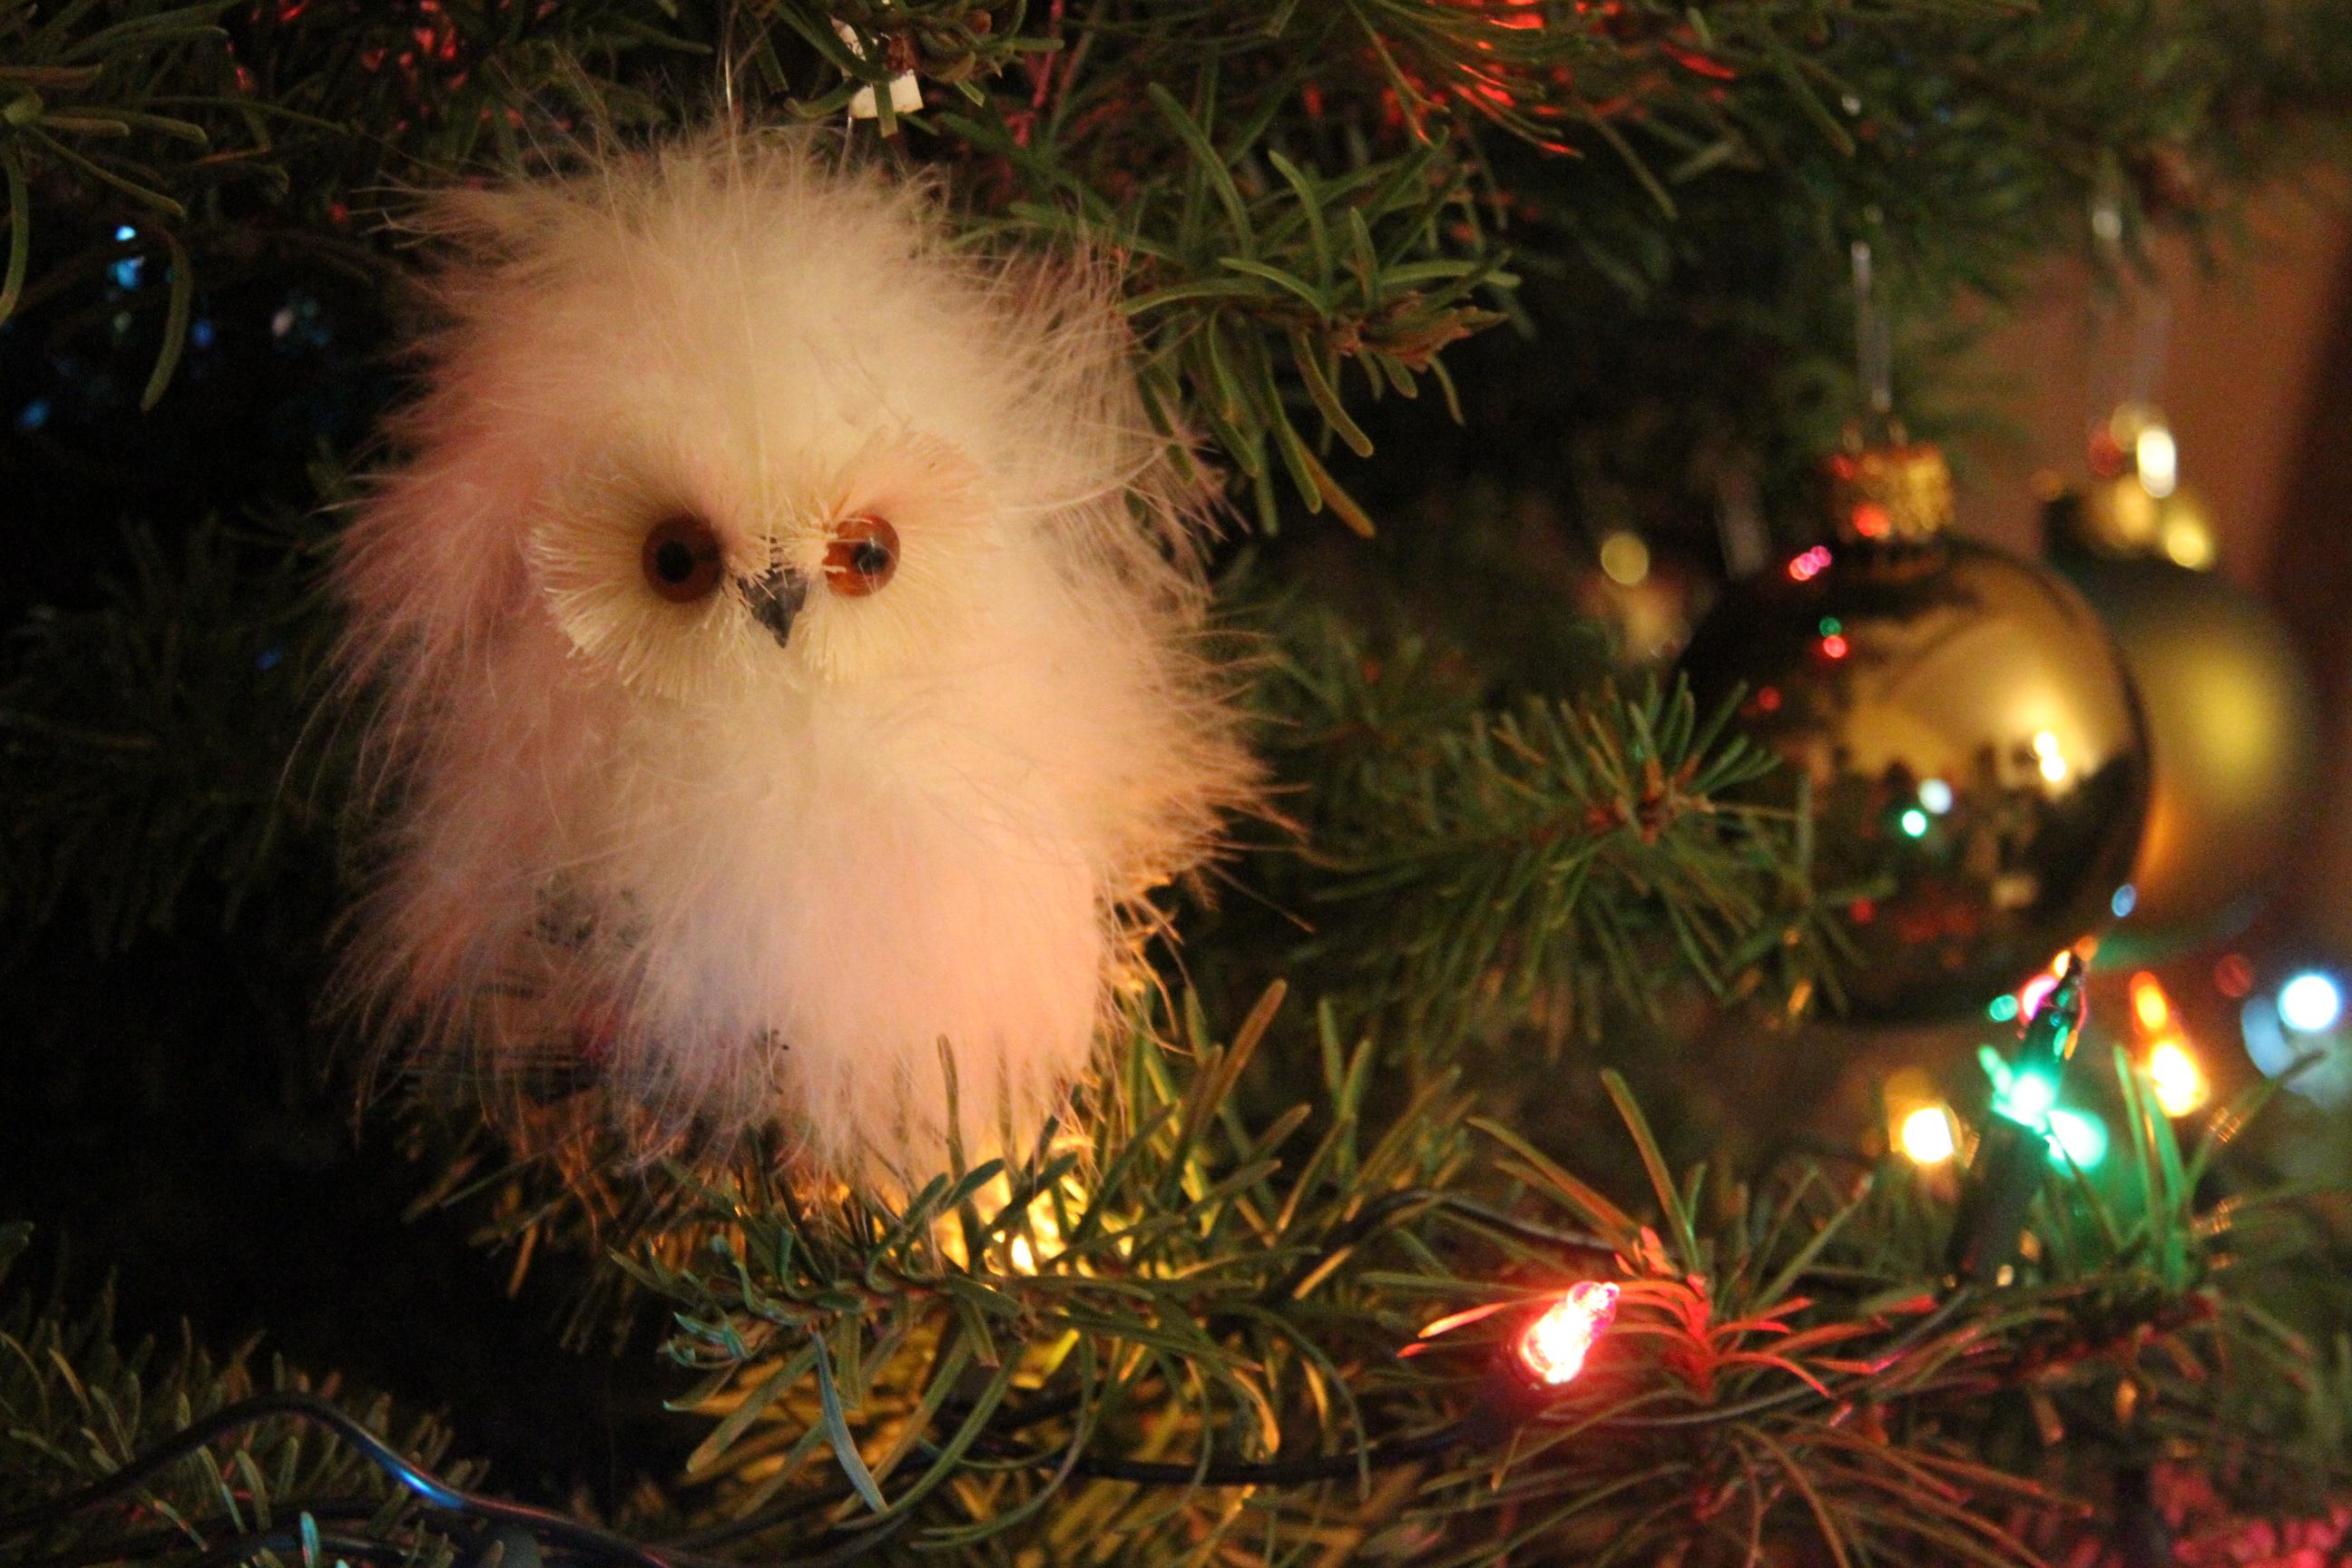 Bird ornaments on a Christmas tree